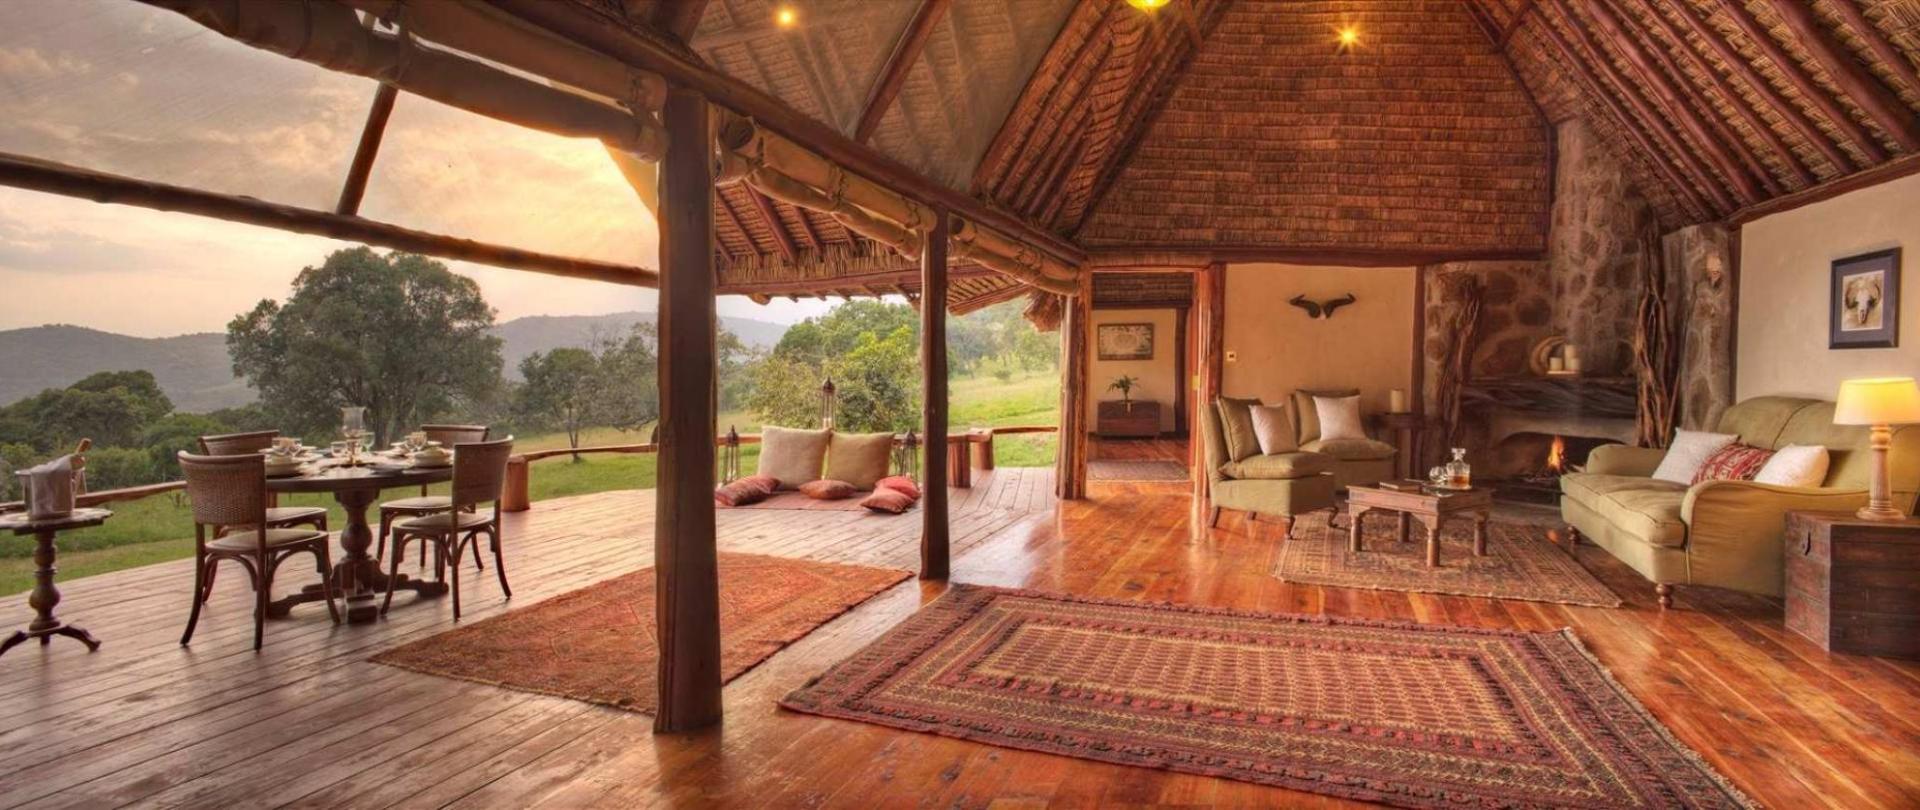 Saruni Mara Accommodation Masai Mara